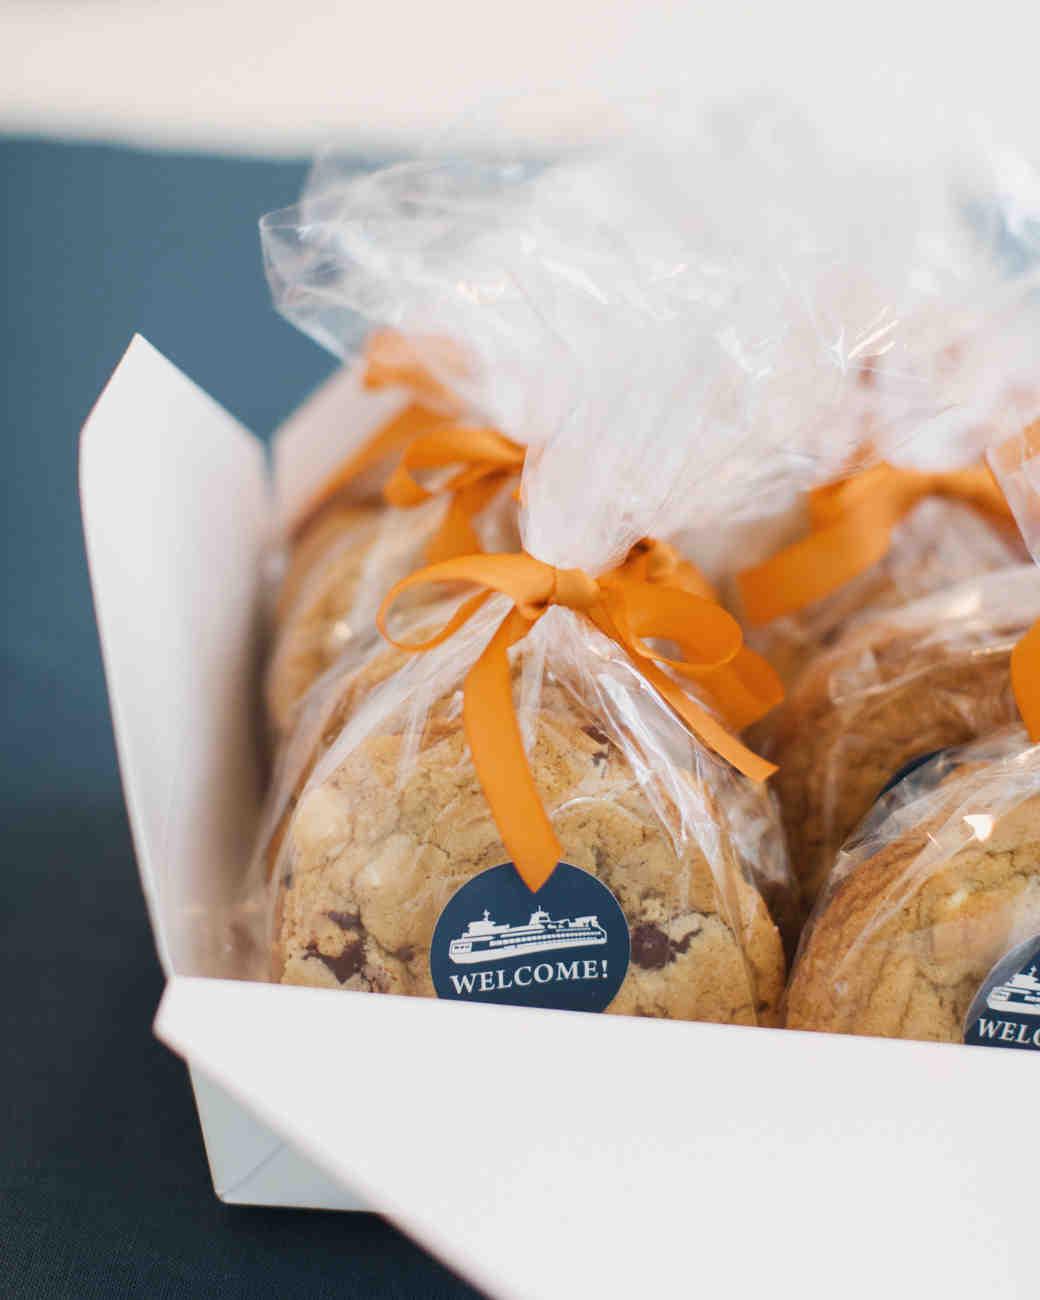 craig-andrew-wedding-cookies-015-s111833-0215.jpg